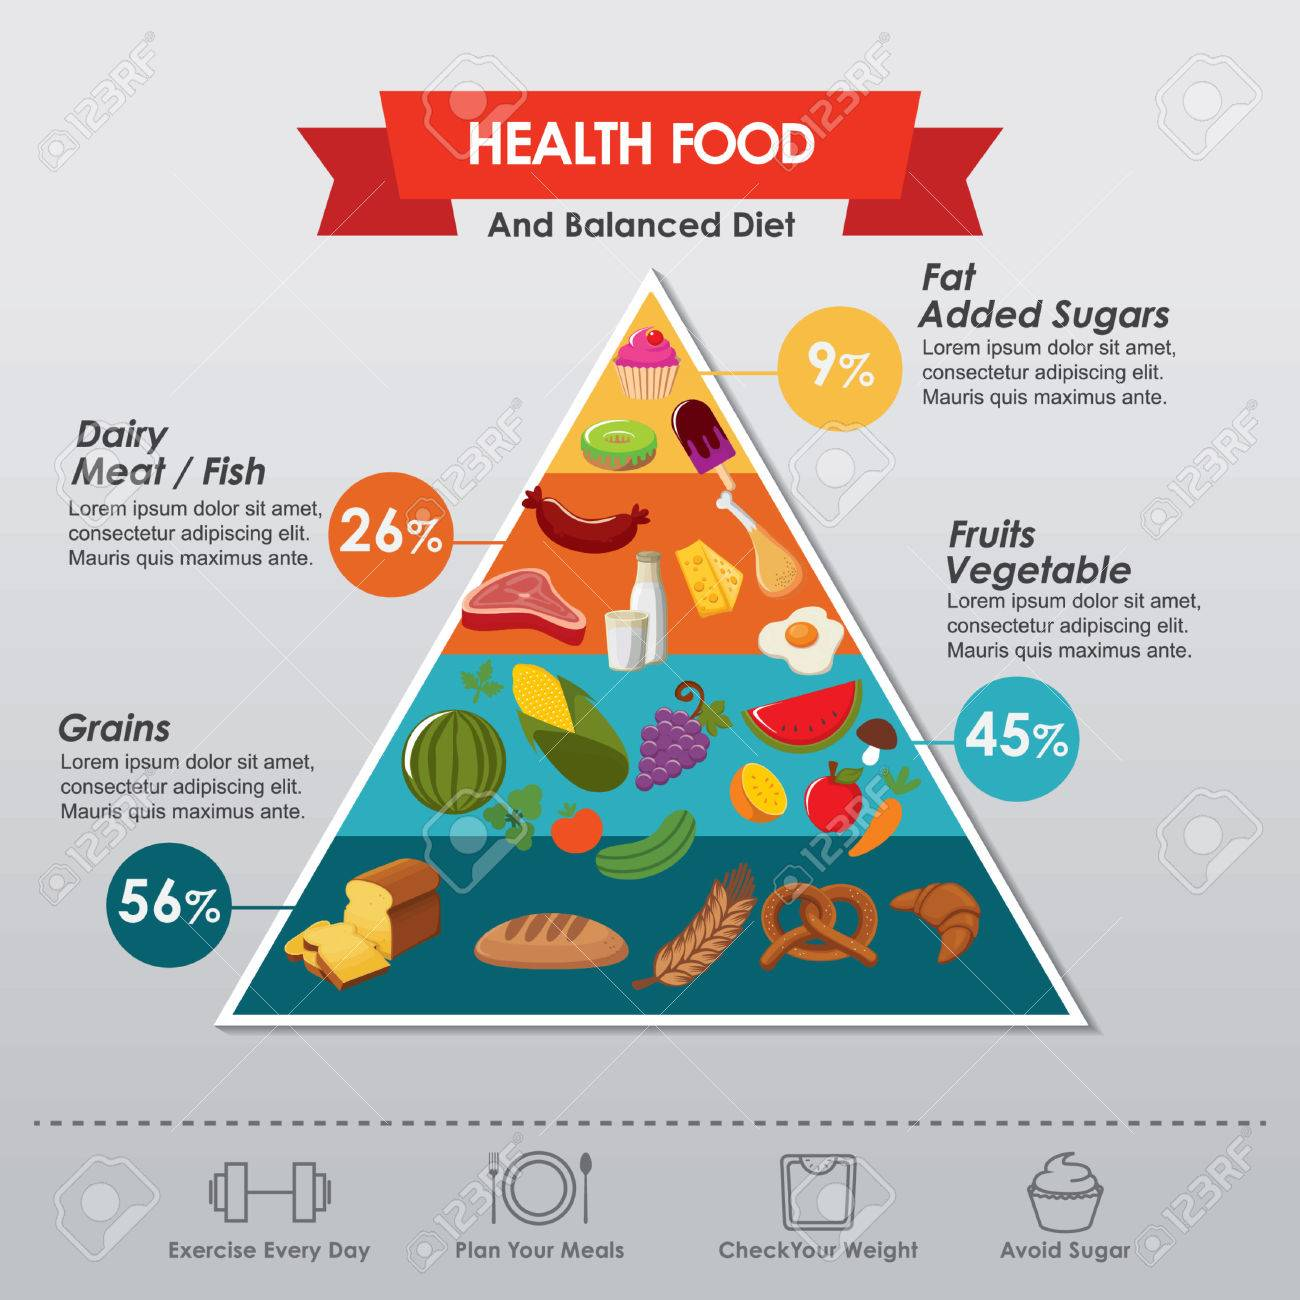 how to design a balanced diet